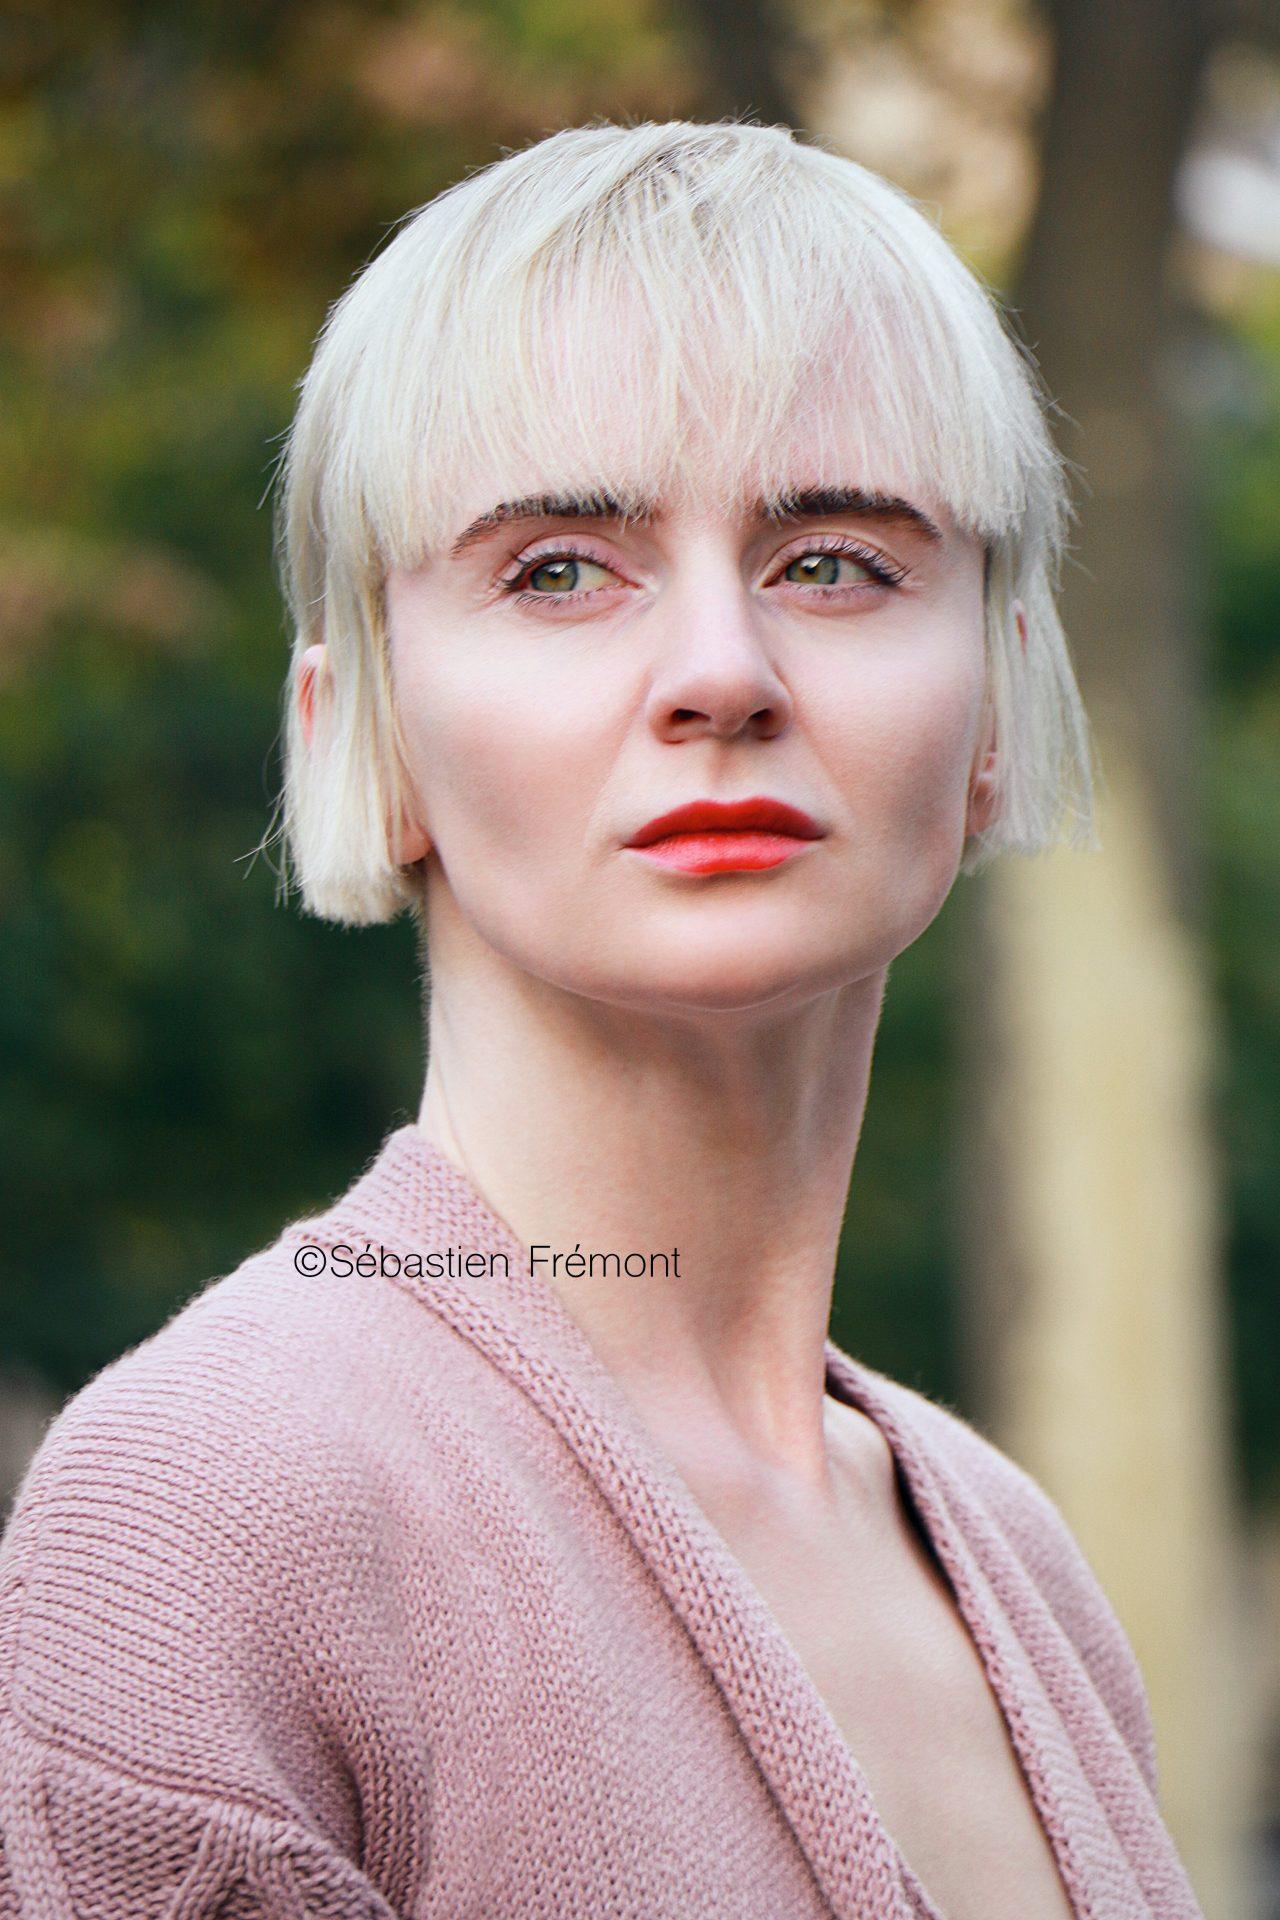 French Photographer Portrait Photography Olga Yanul / L'Officiel Ukraine/ Christophe Lemaire